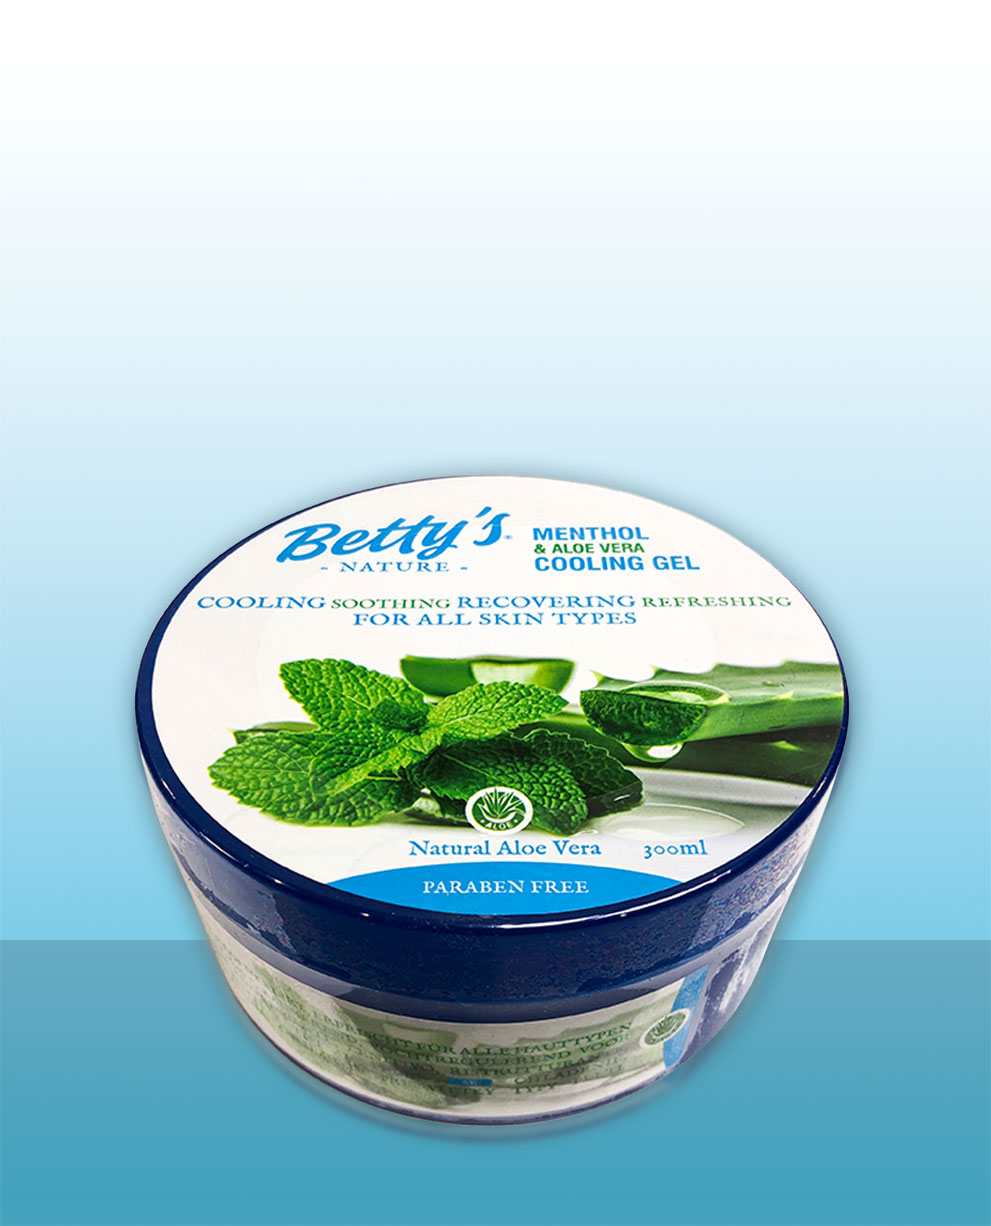 Menthol-aloevera-cooling-gel-01-BettysNature-bakingsoda-nl